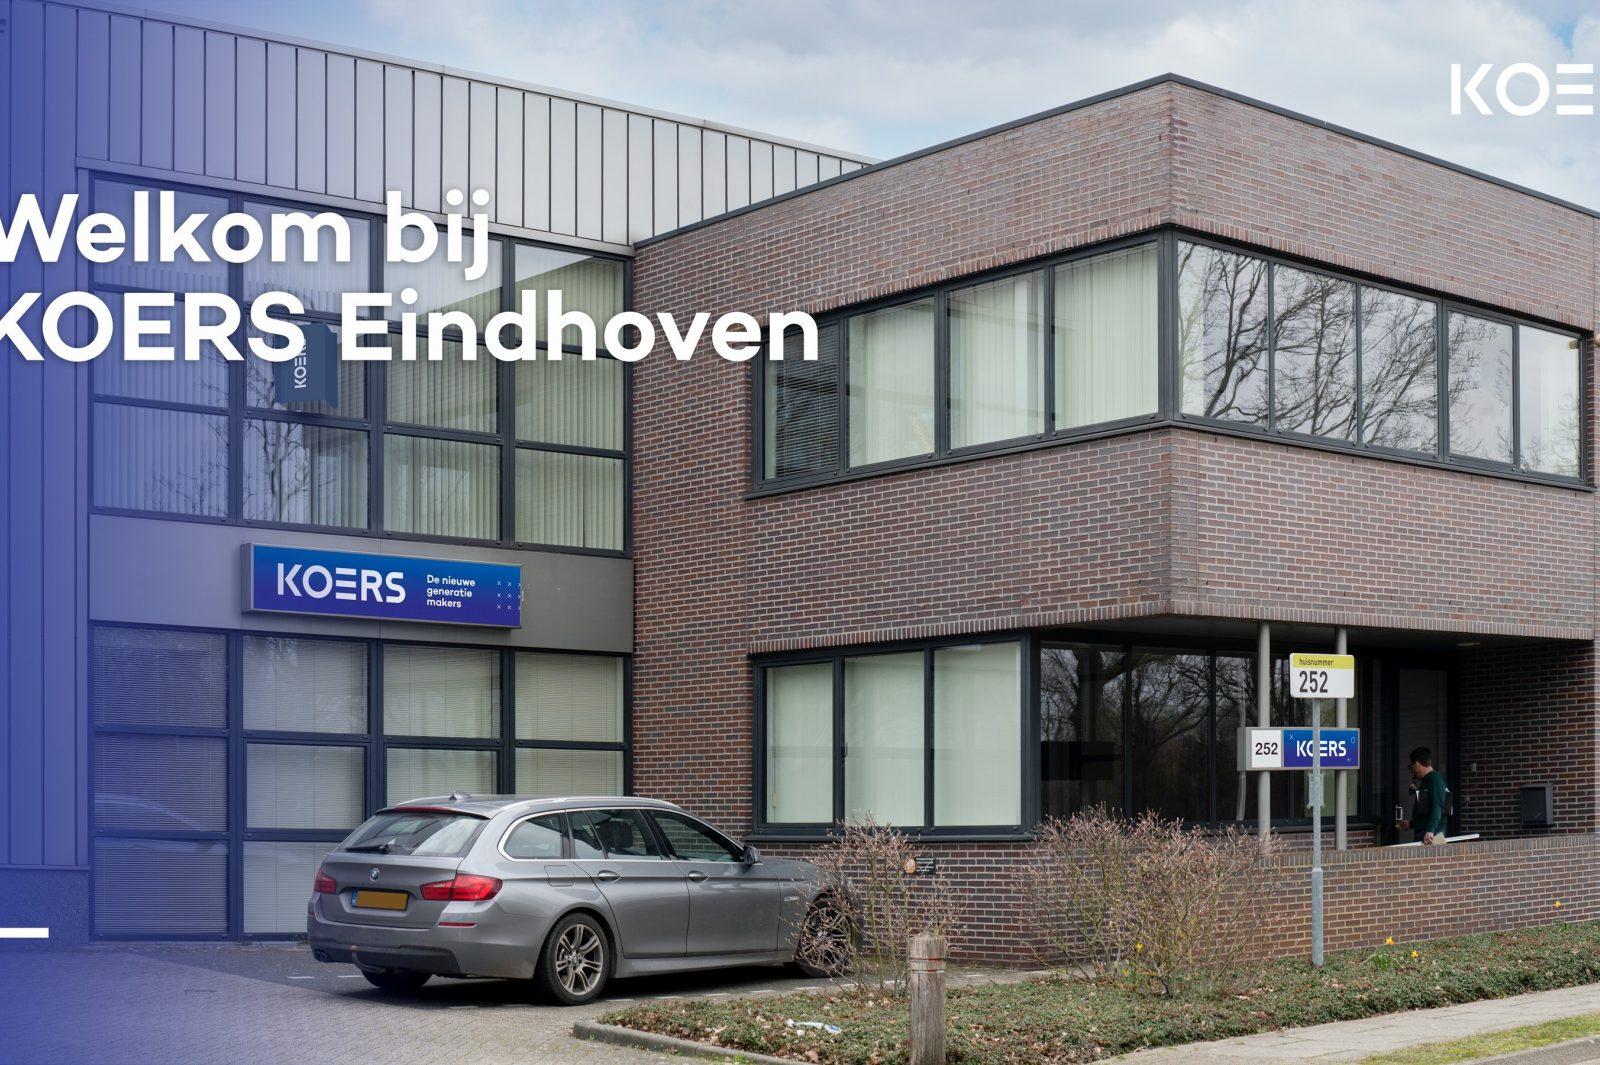 KOERS Eindhoven